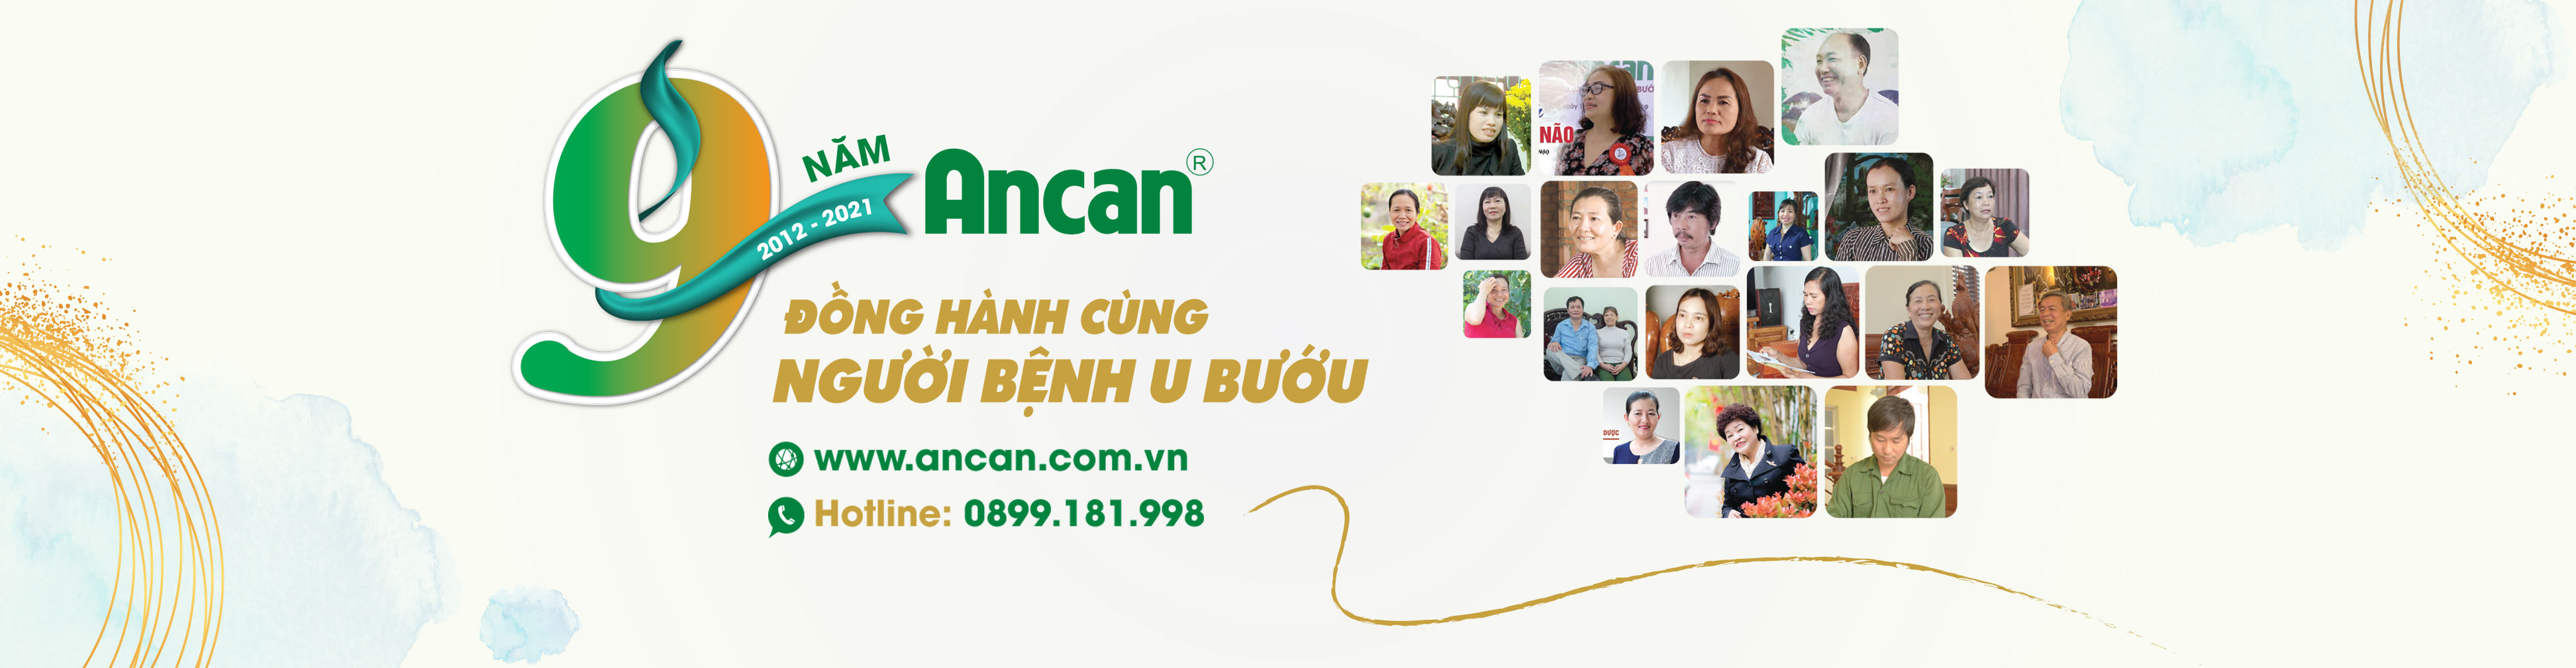 banner-WEB.jpg_4012